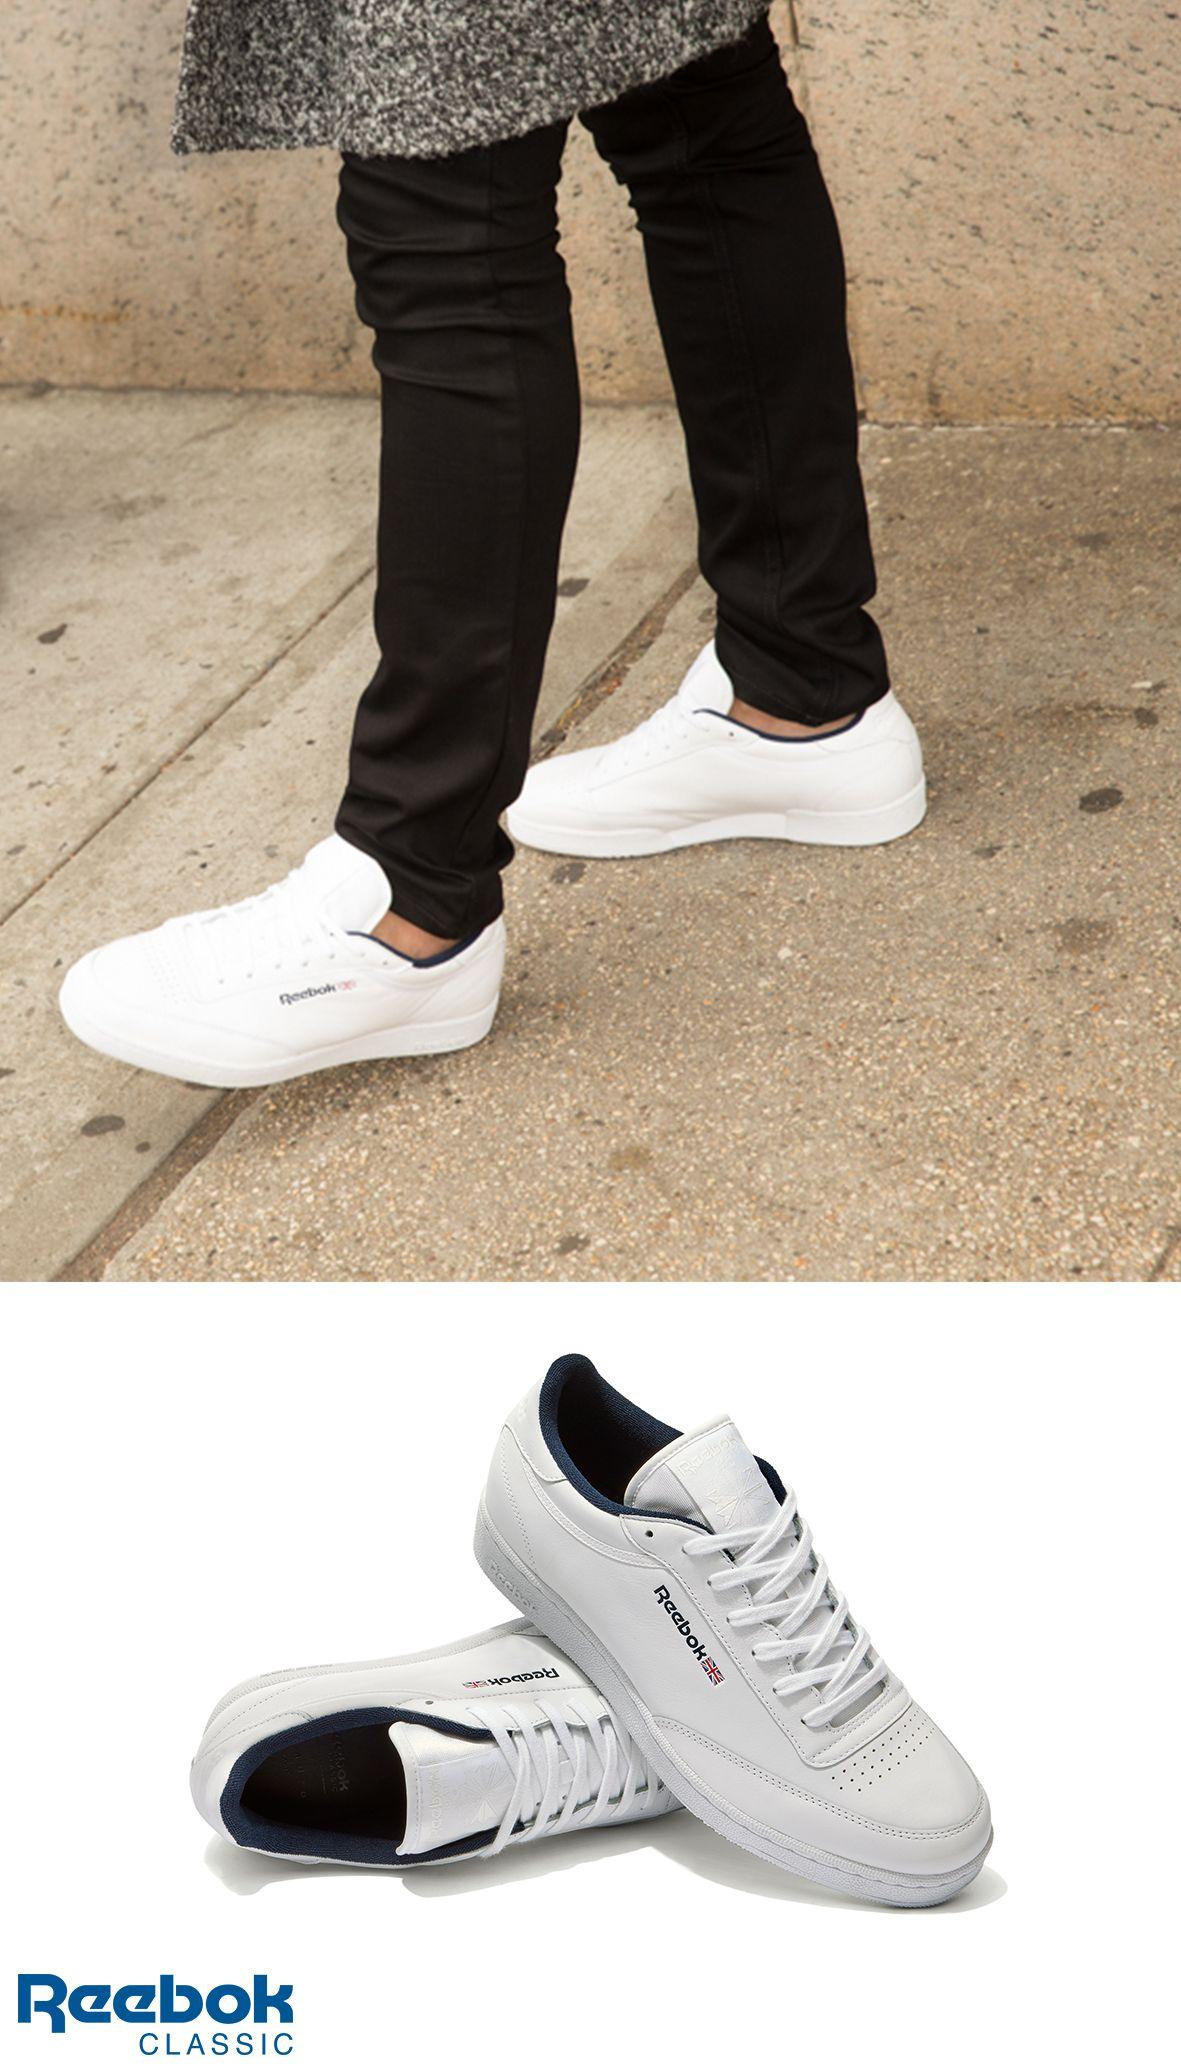 reebok classic ace mens tennis shoes